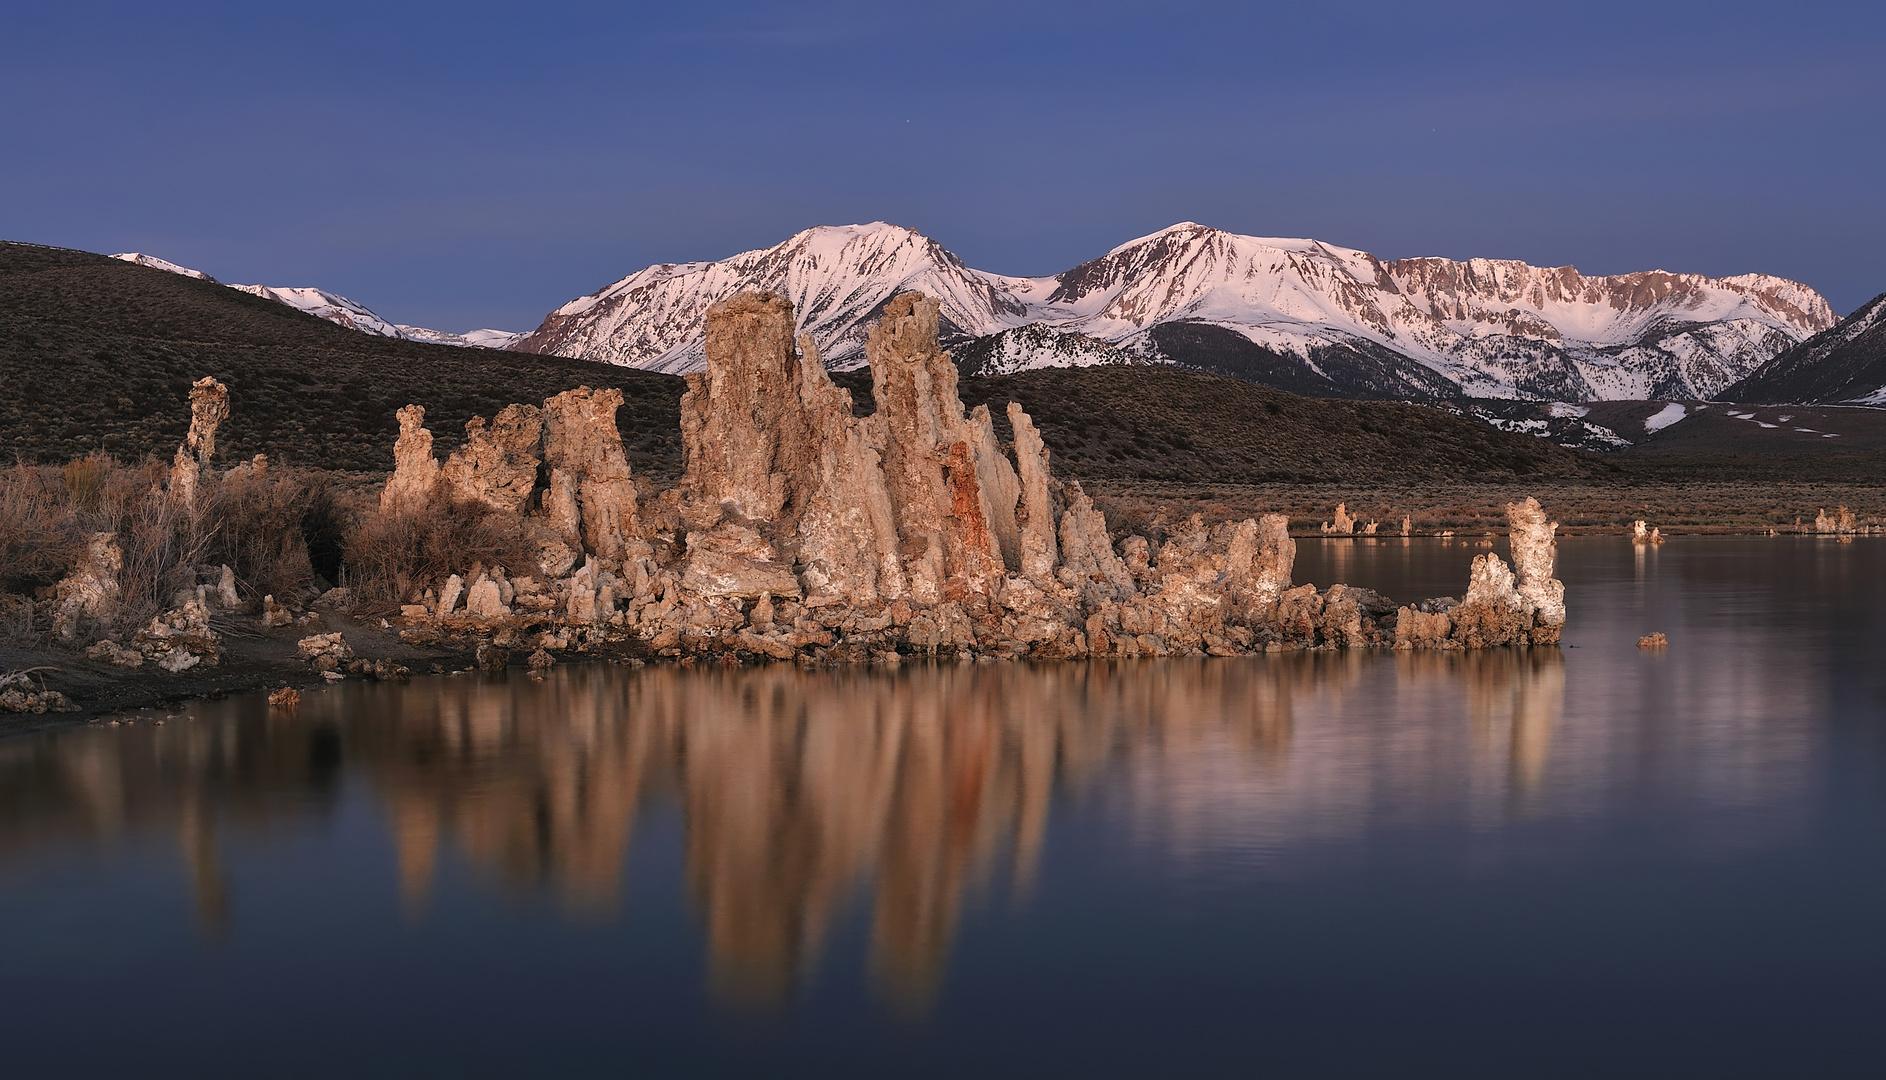 *Mono Lake at dawn*